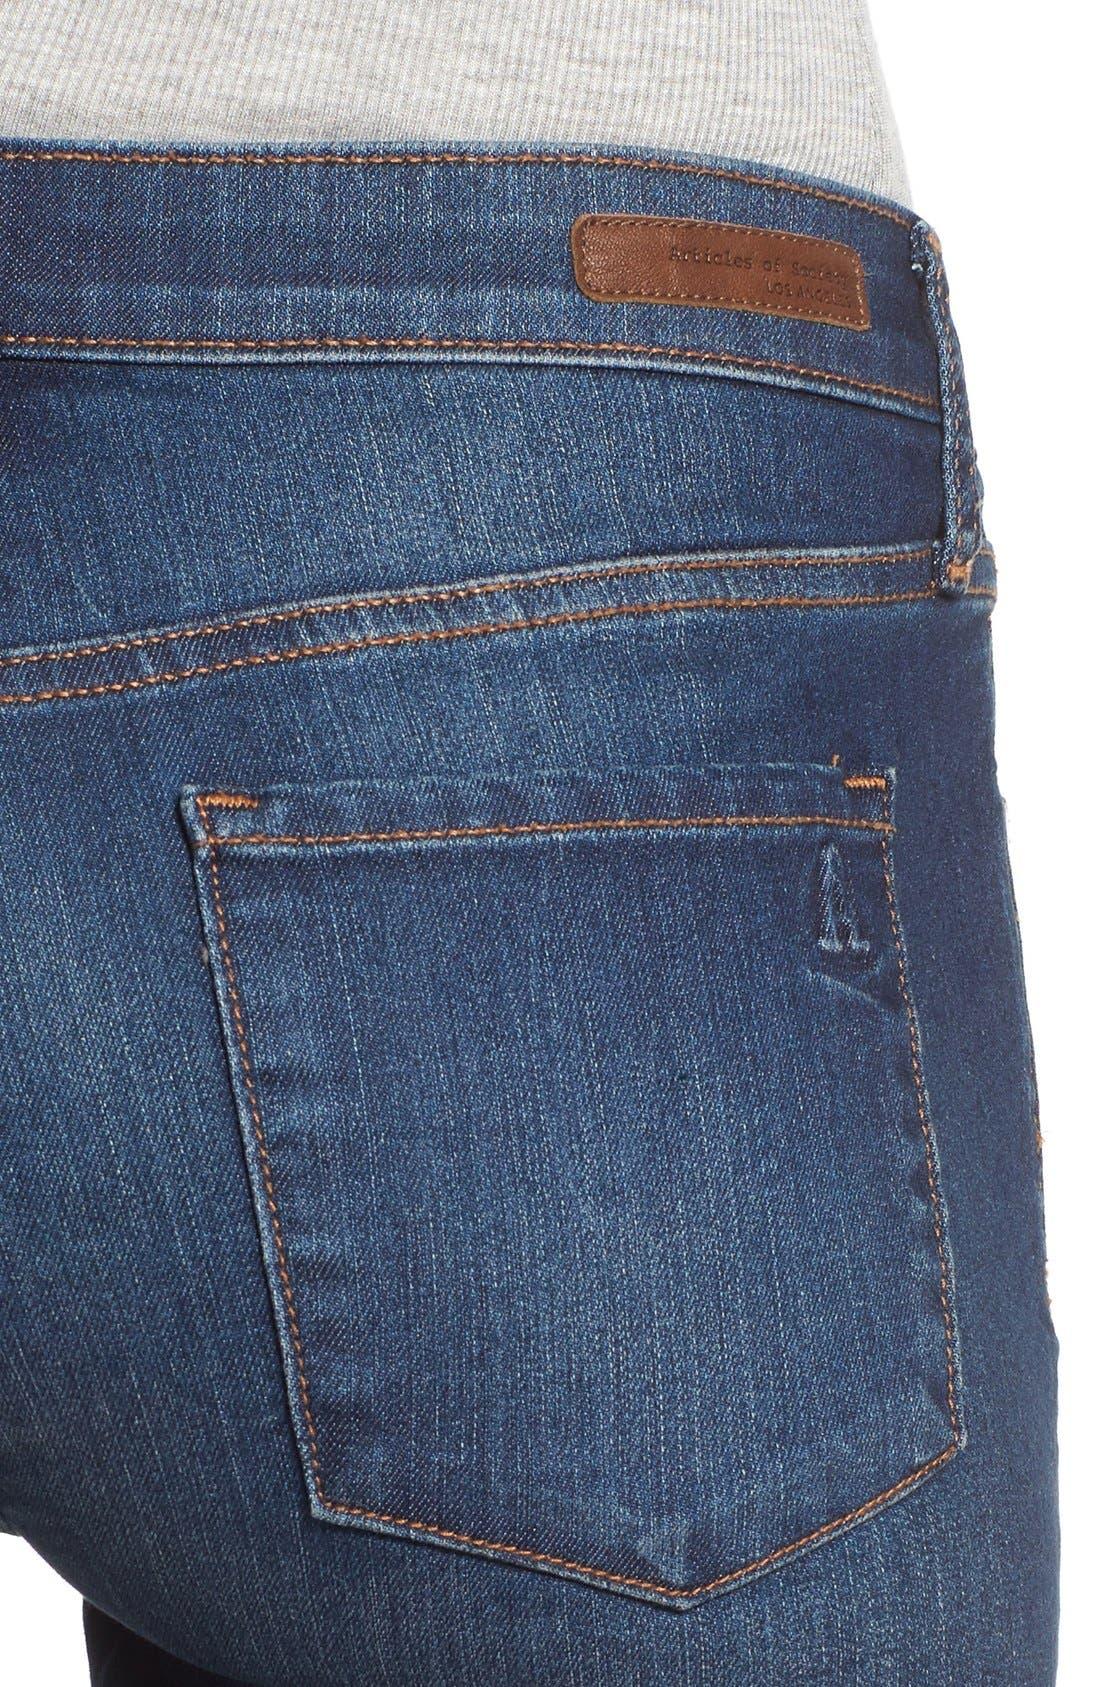 Alternate Image 5  - Articles of Society 'Mya' Skinny Jeans (Americana)